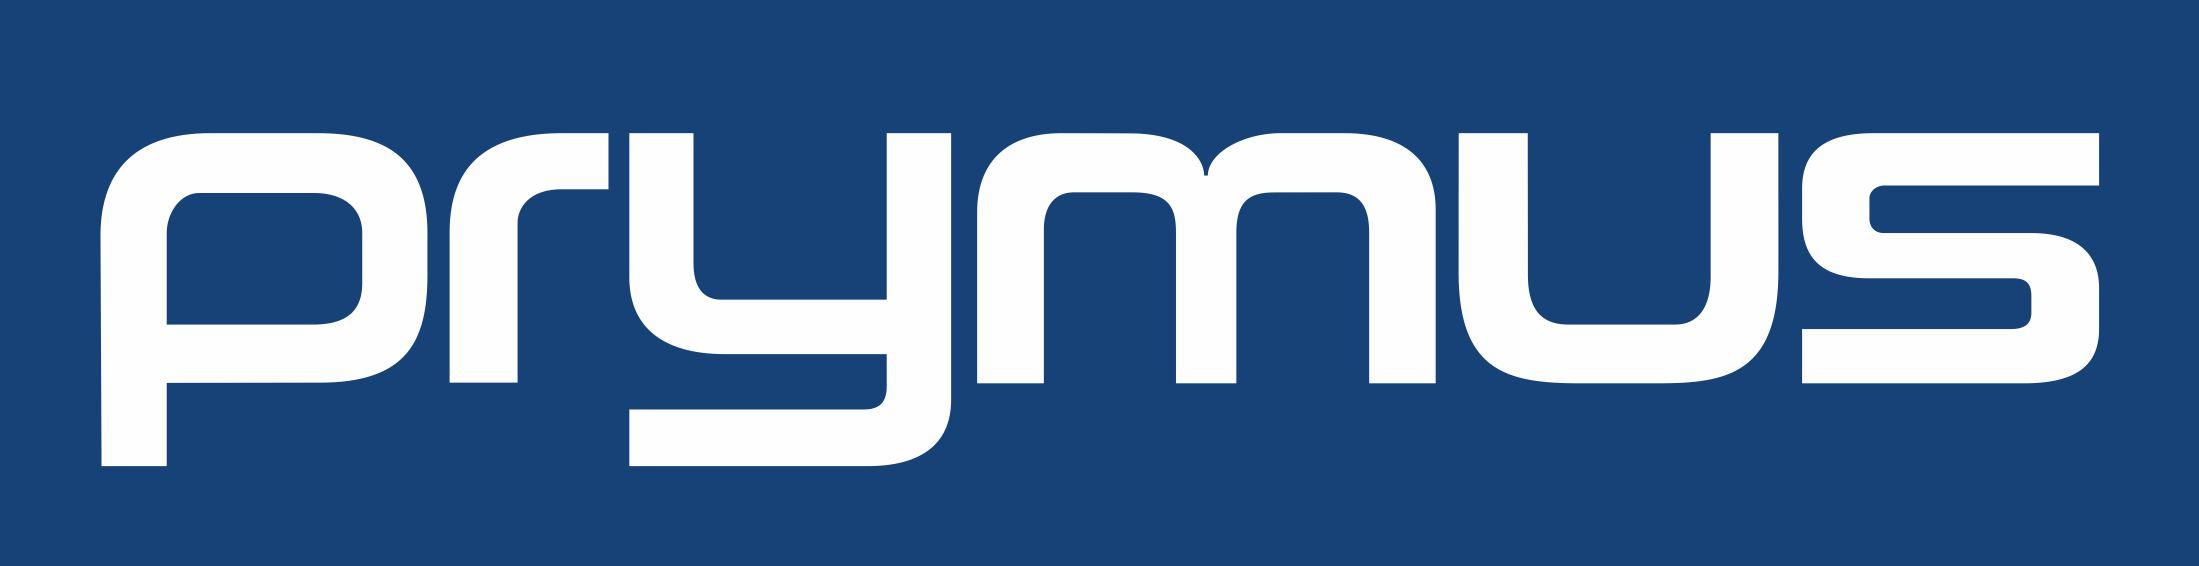 Prymus_logo